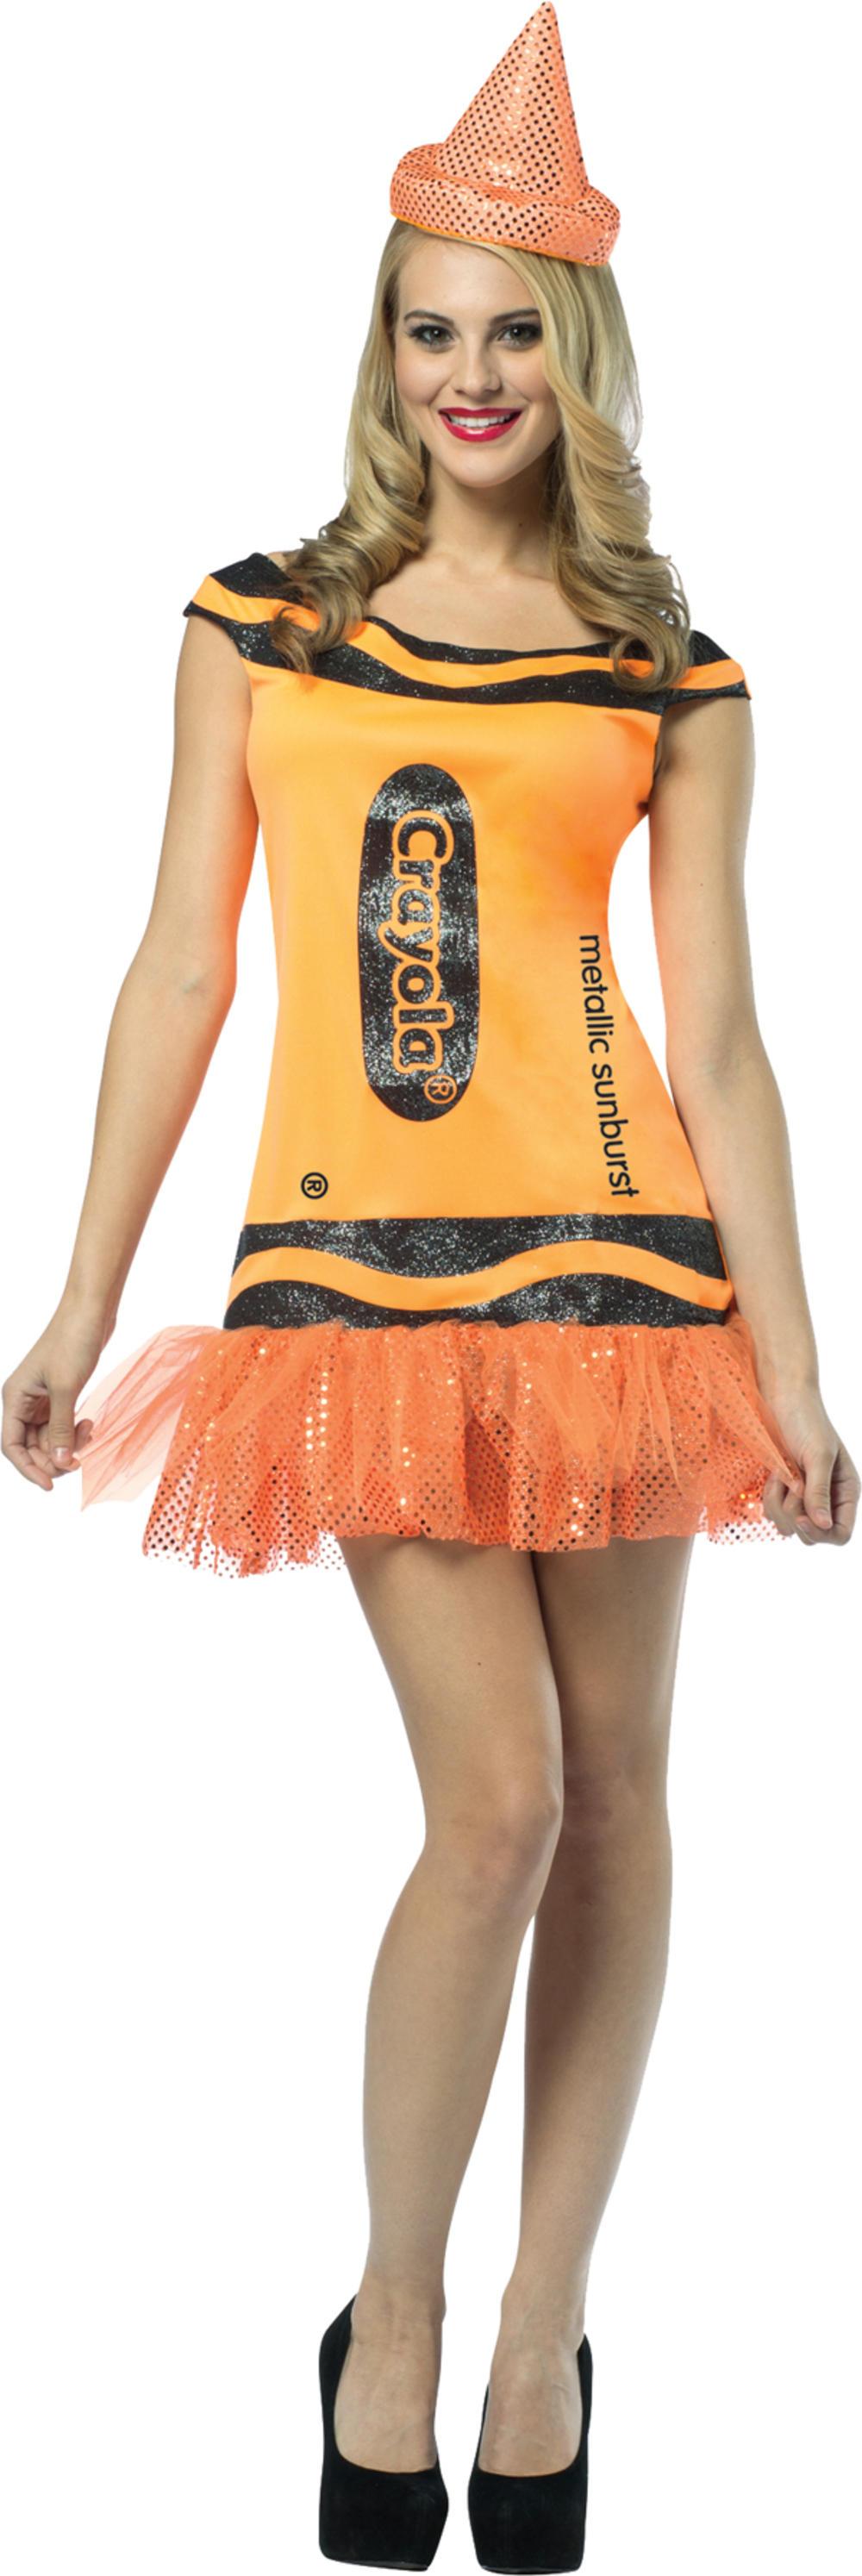 Sunburst Orange Crayola Glitter Dress Women's Costume